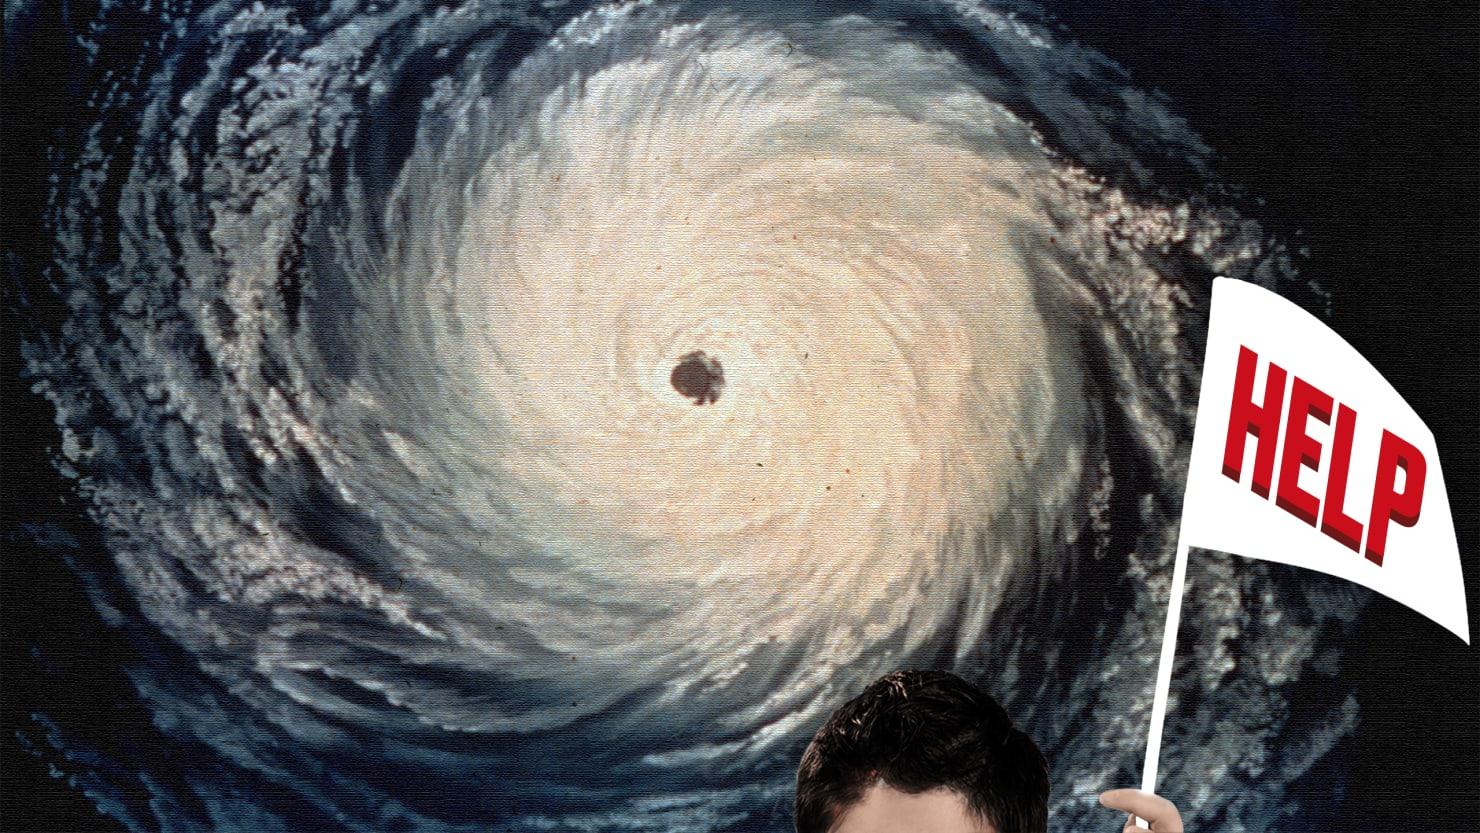 hurricane map maria katrina irma with man holding help sign tropical storm saffir simpson category 1 2 3 4 5